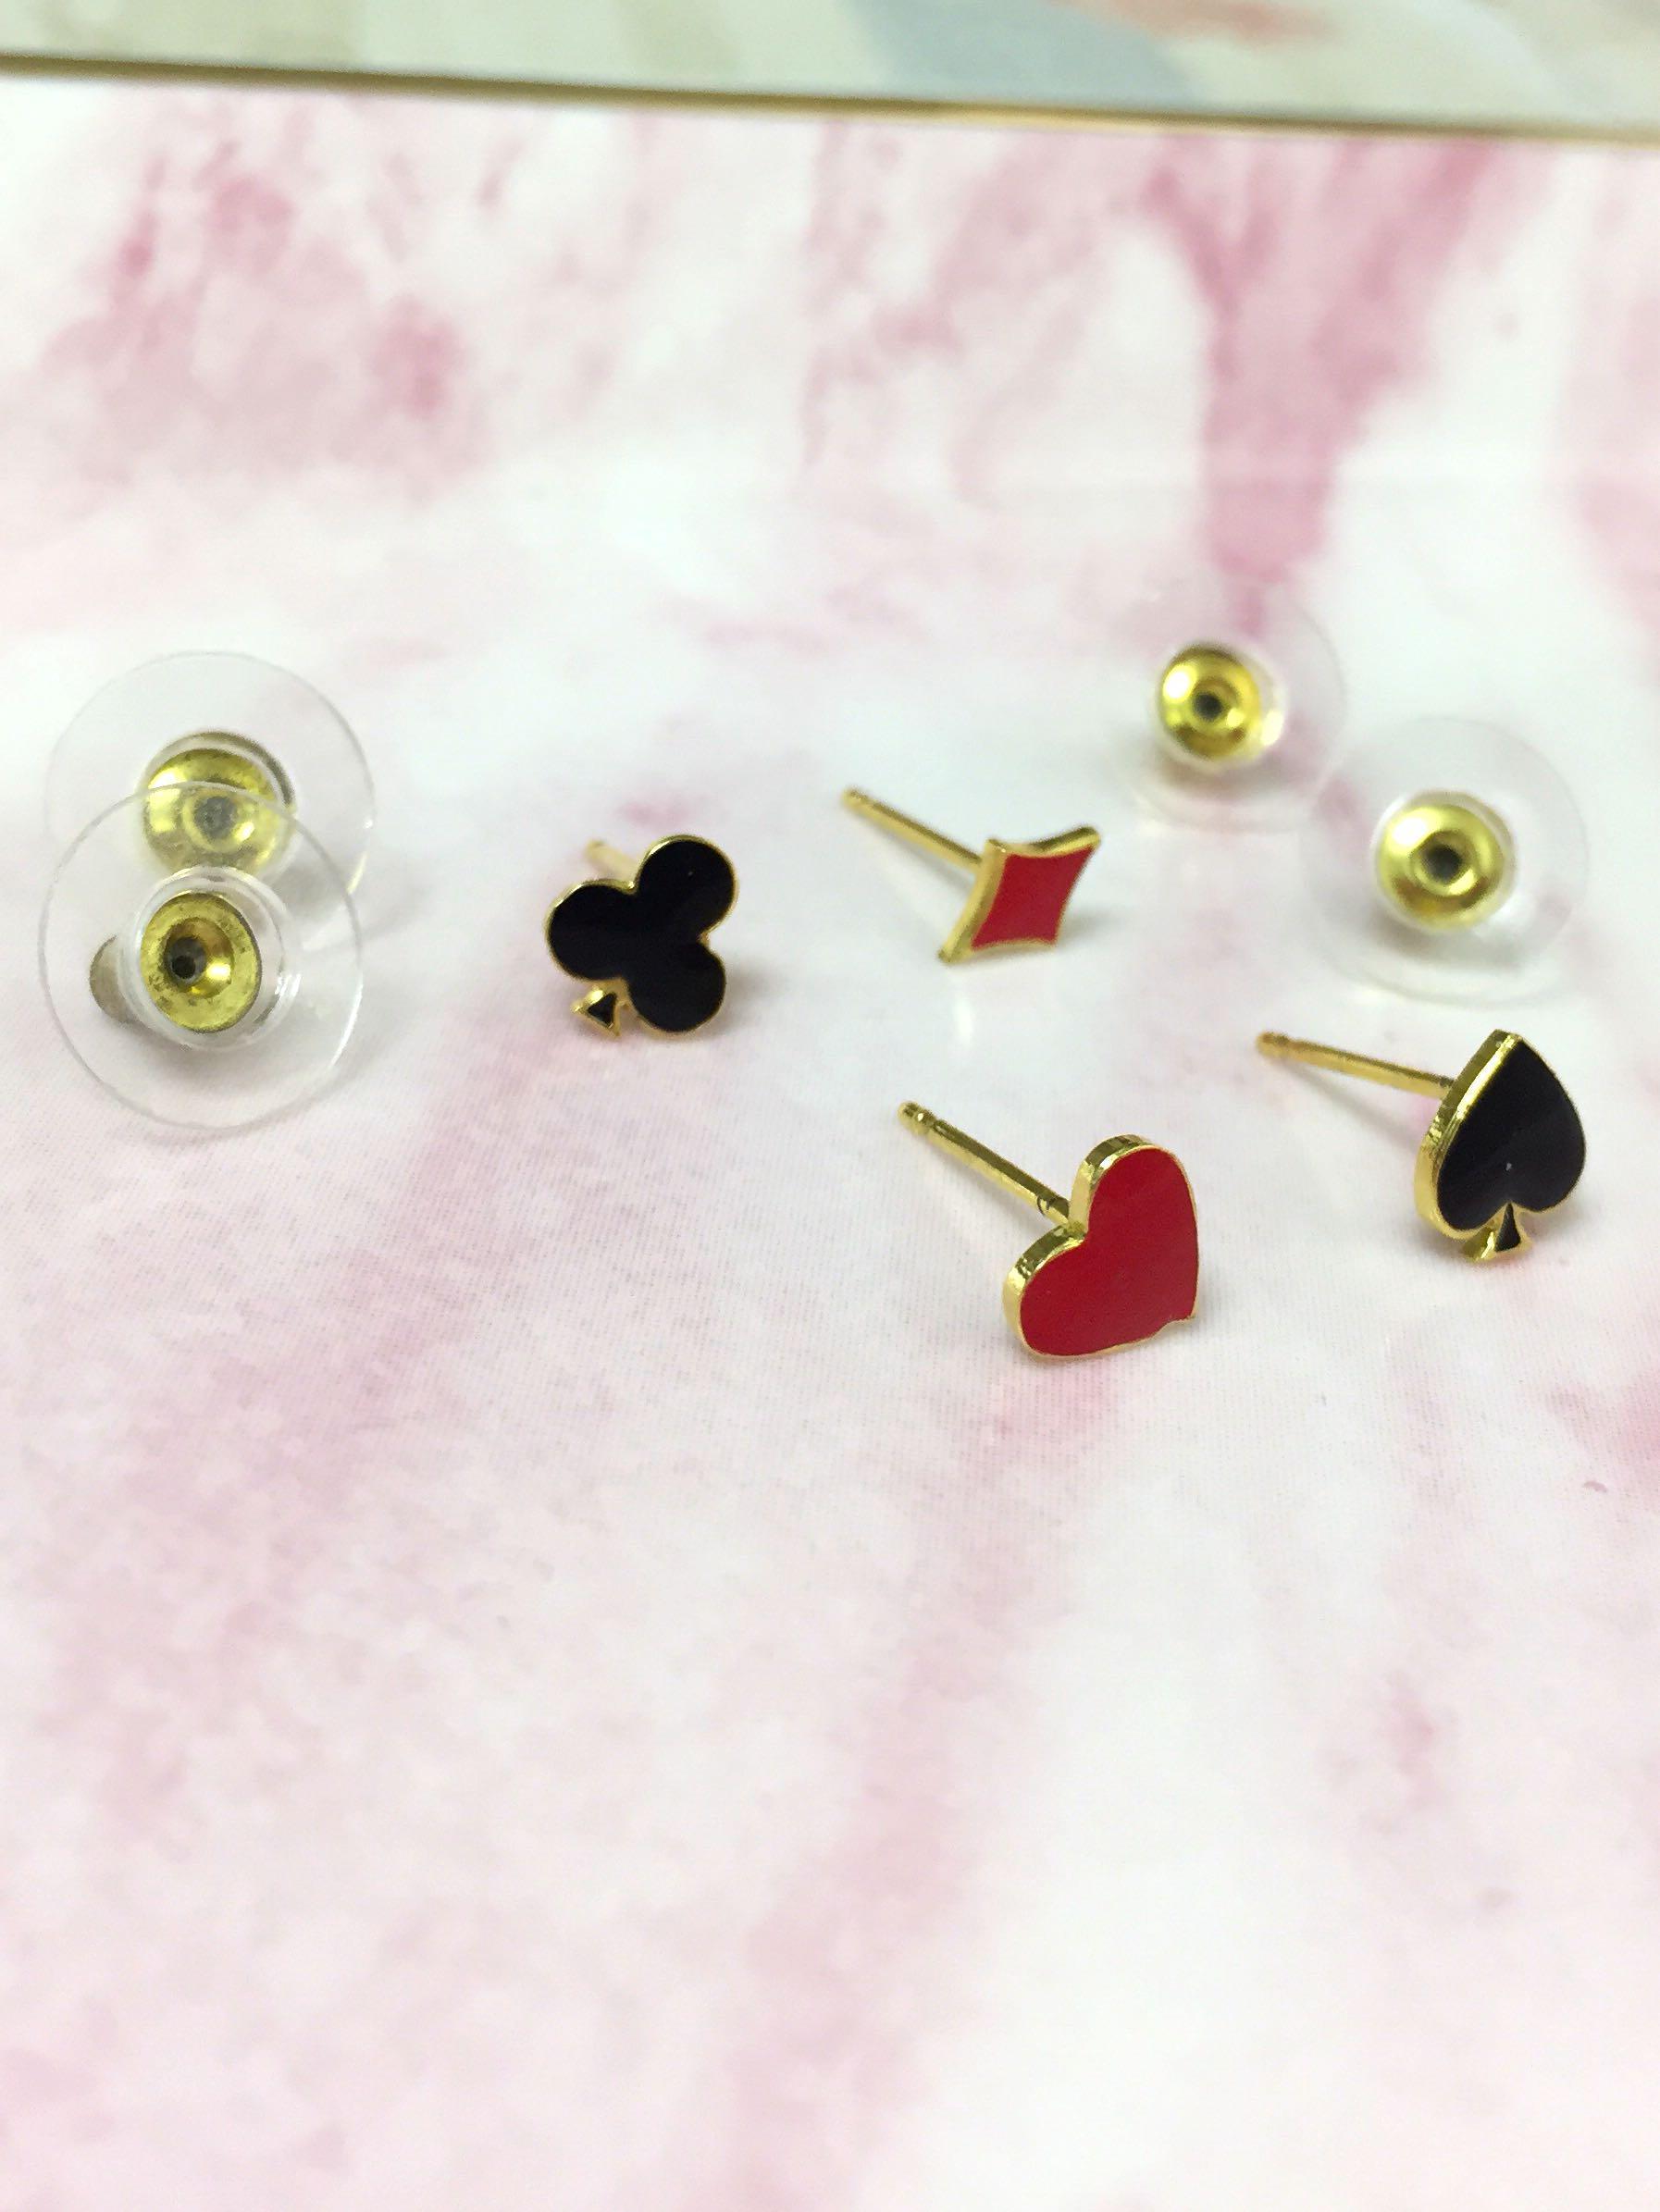 [購自泰國]特別設計師耳環 Thailand Designer's Earring